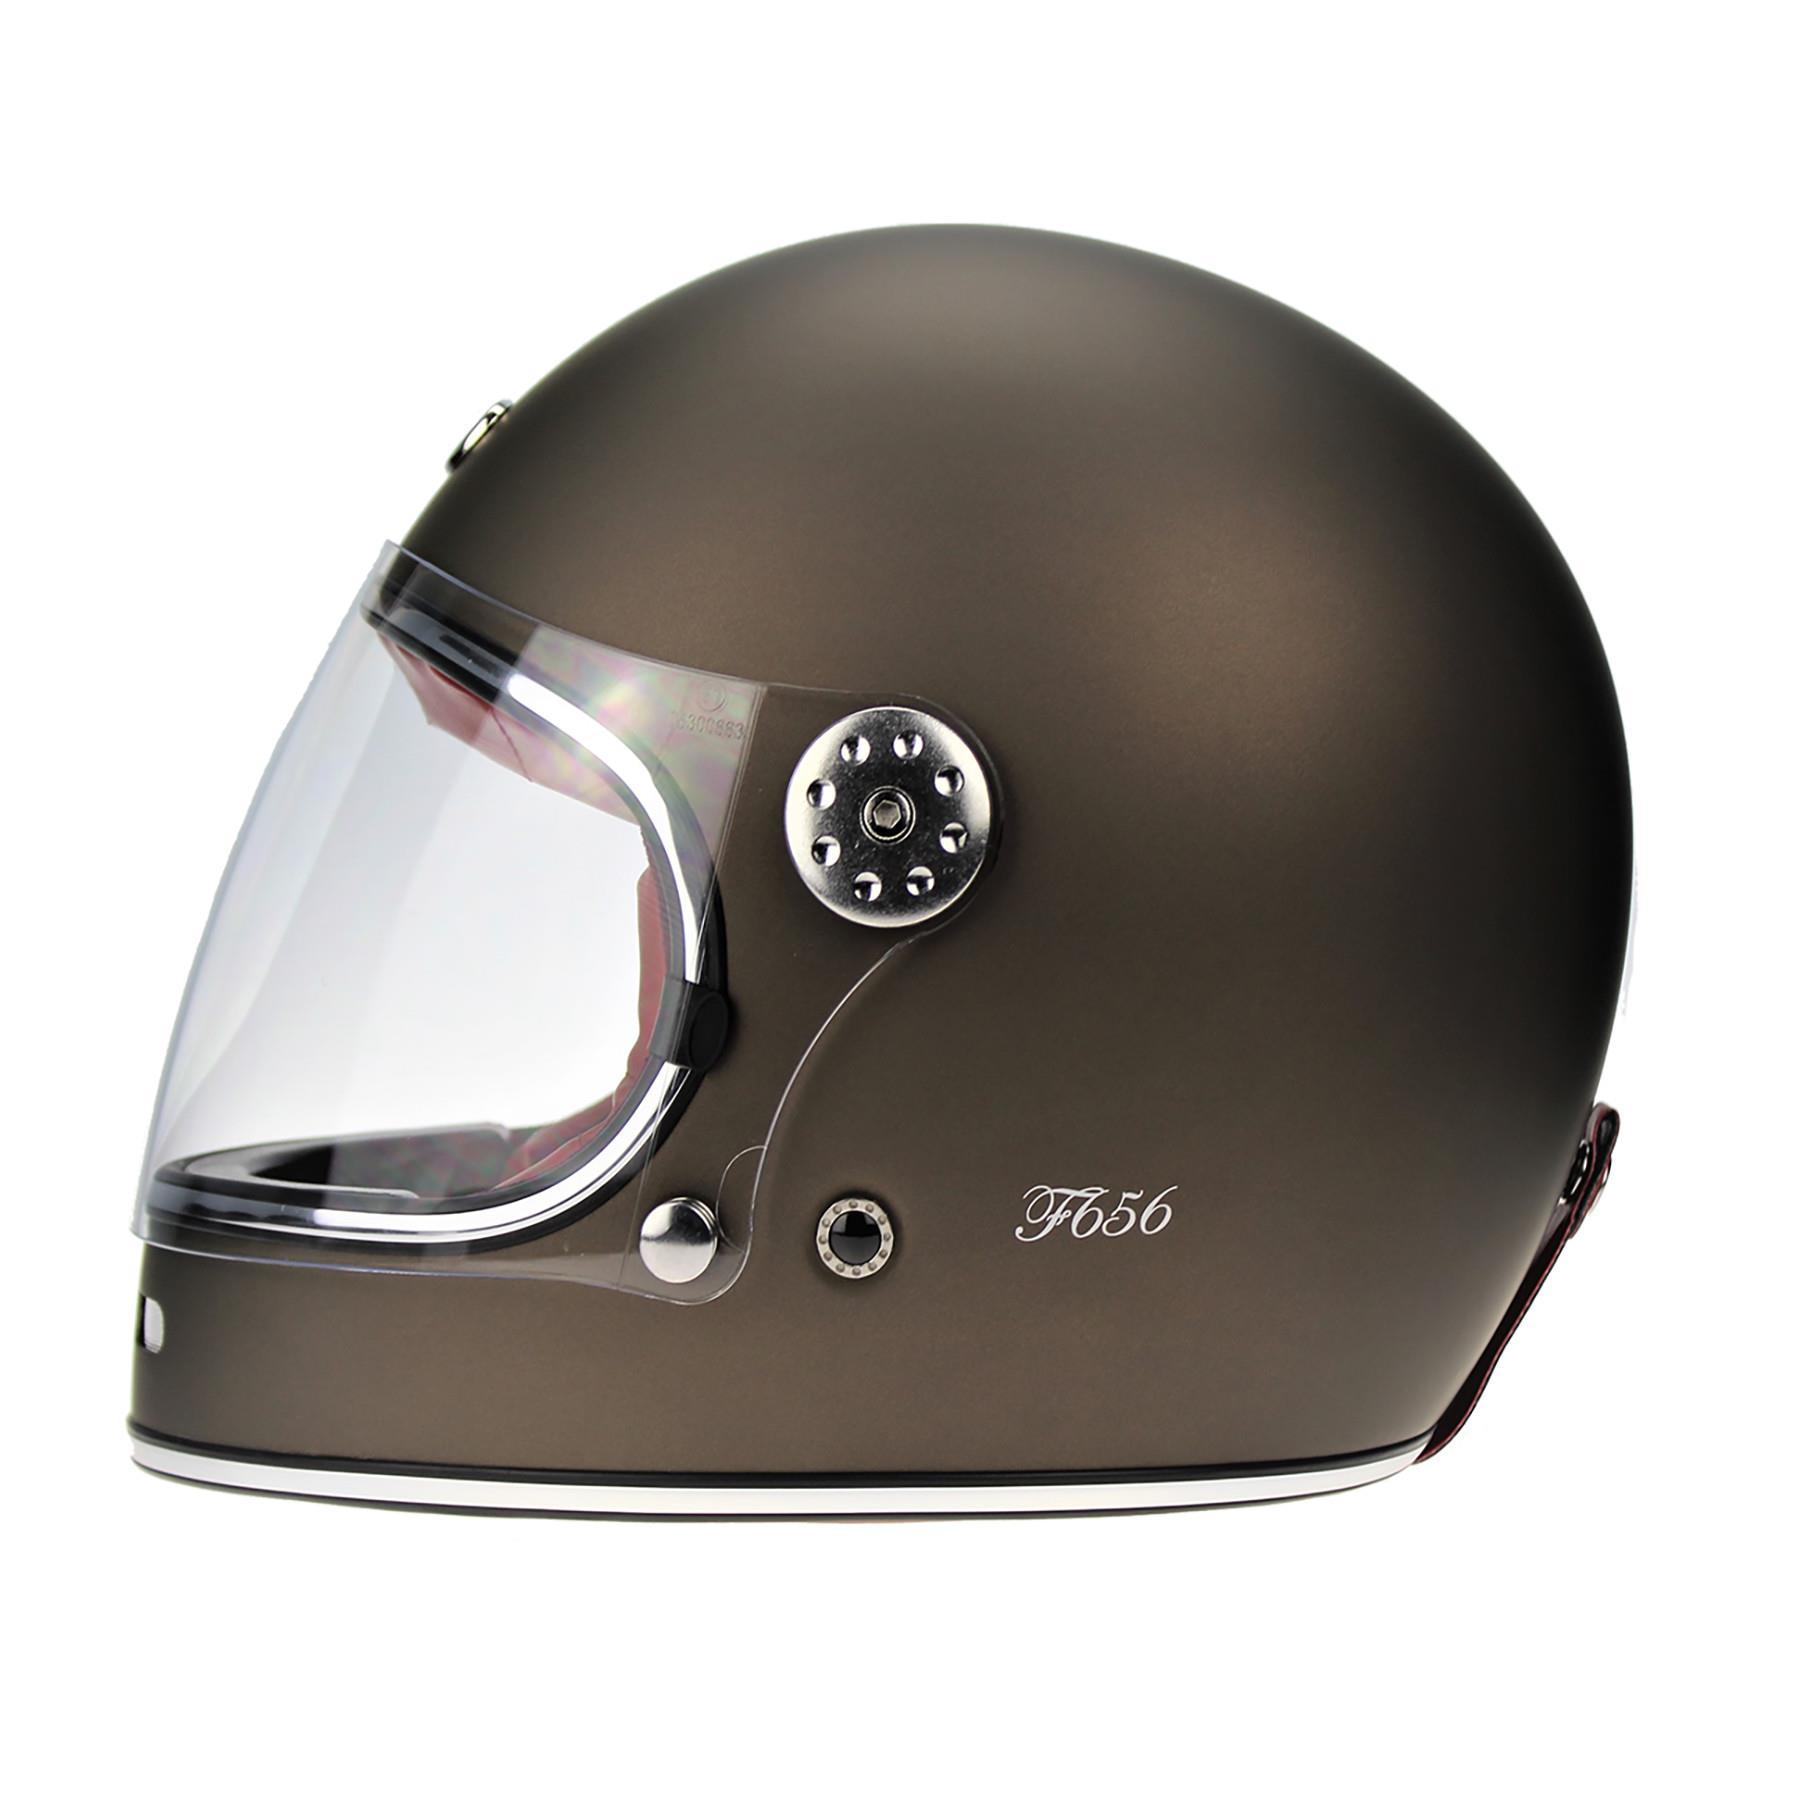 Viper-F656-Retro-Vintage-FibreGlass-Full-Face-Motorcycle-Bike-Road-Crash-Helmet miniature 25